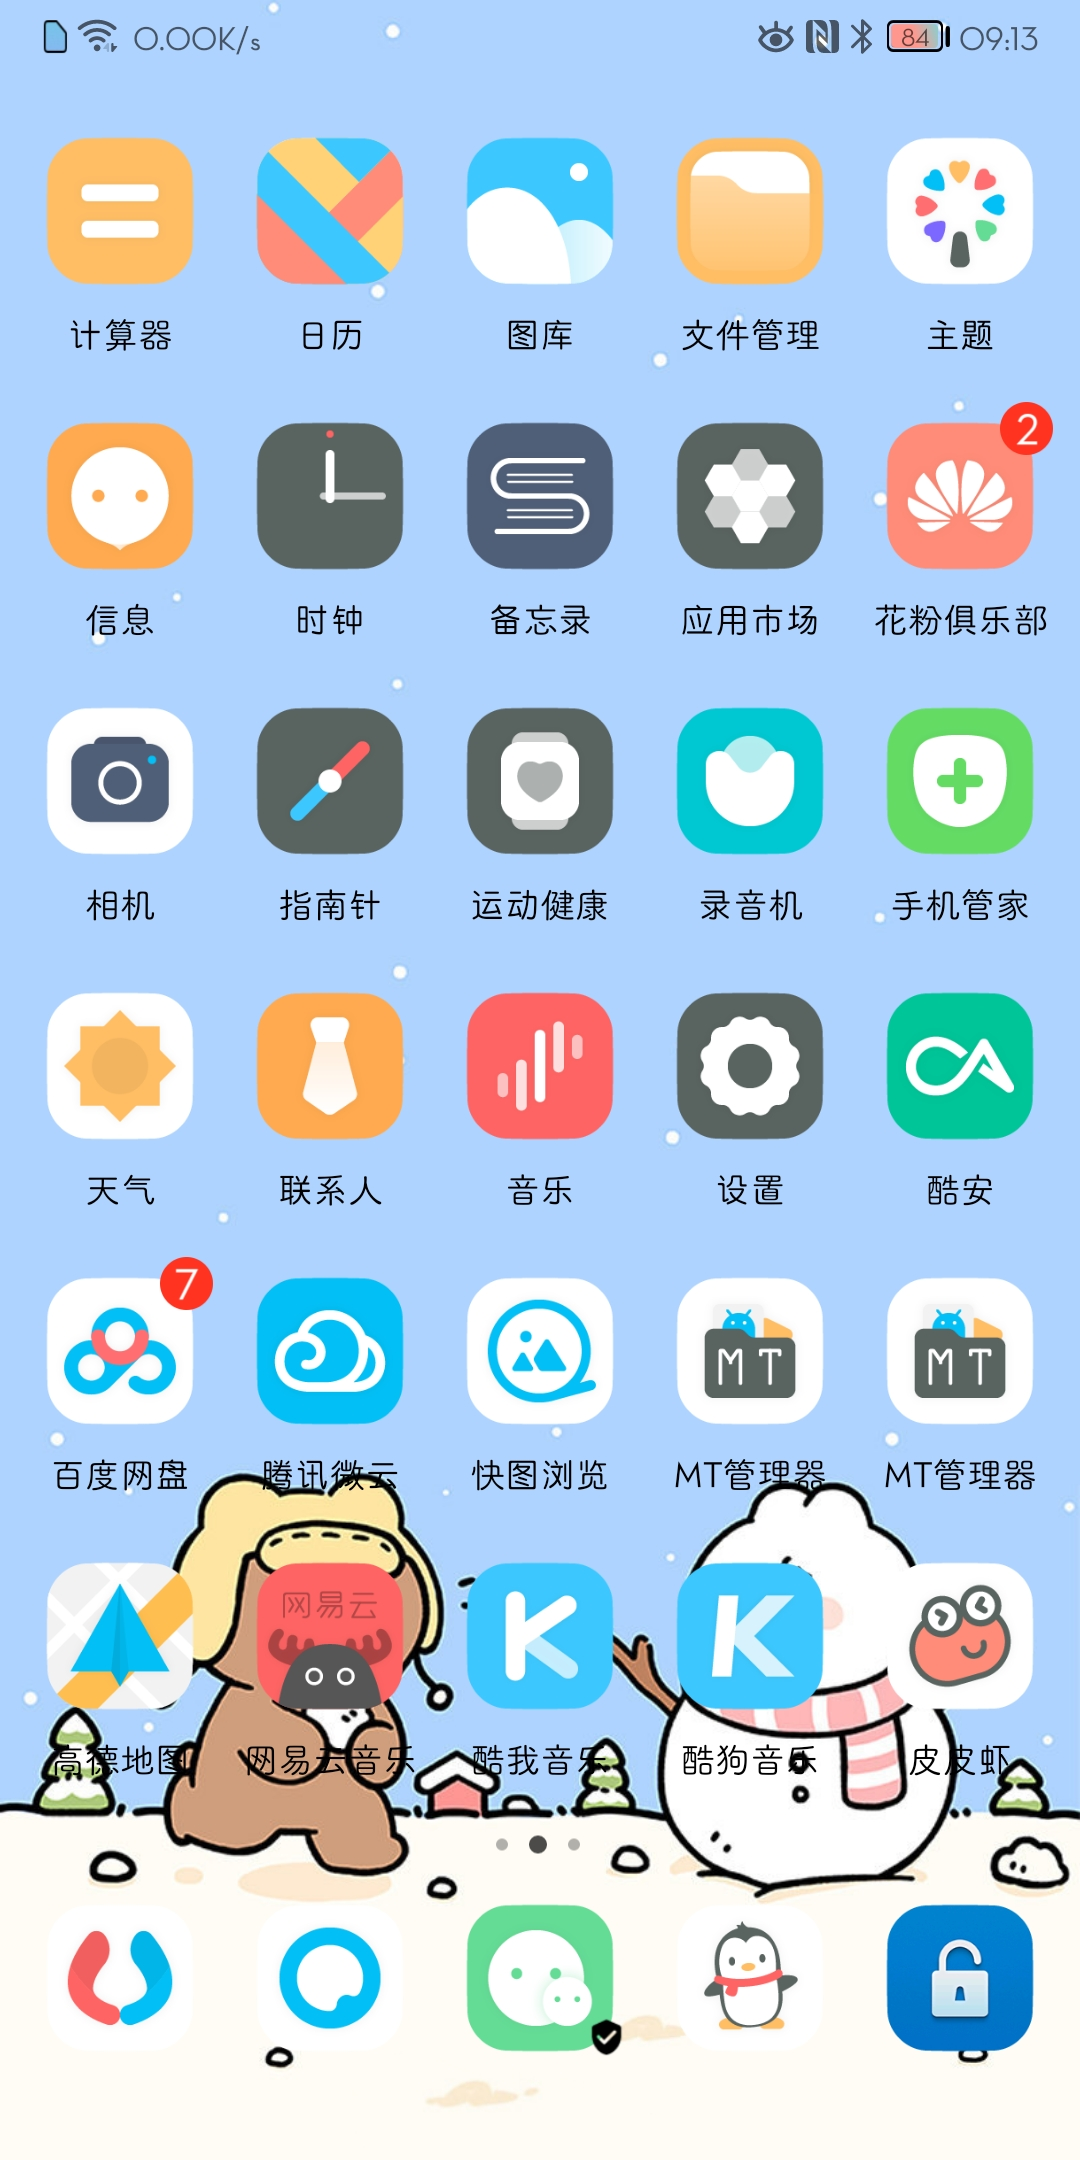 Screenshot_20201216_091359_com.huawei.android.lau.jpg